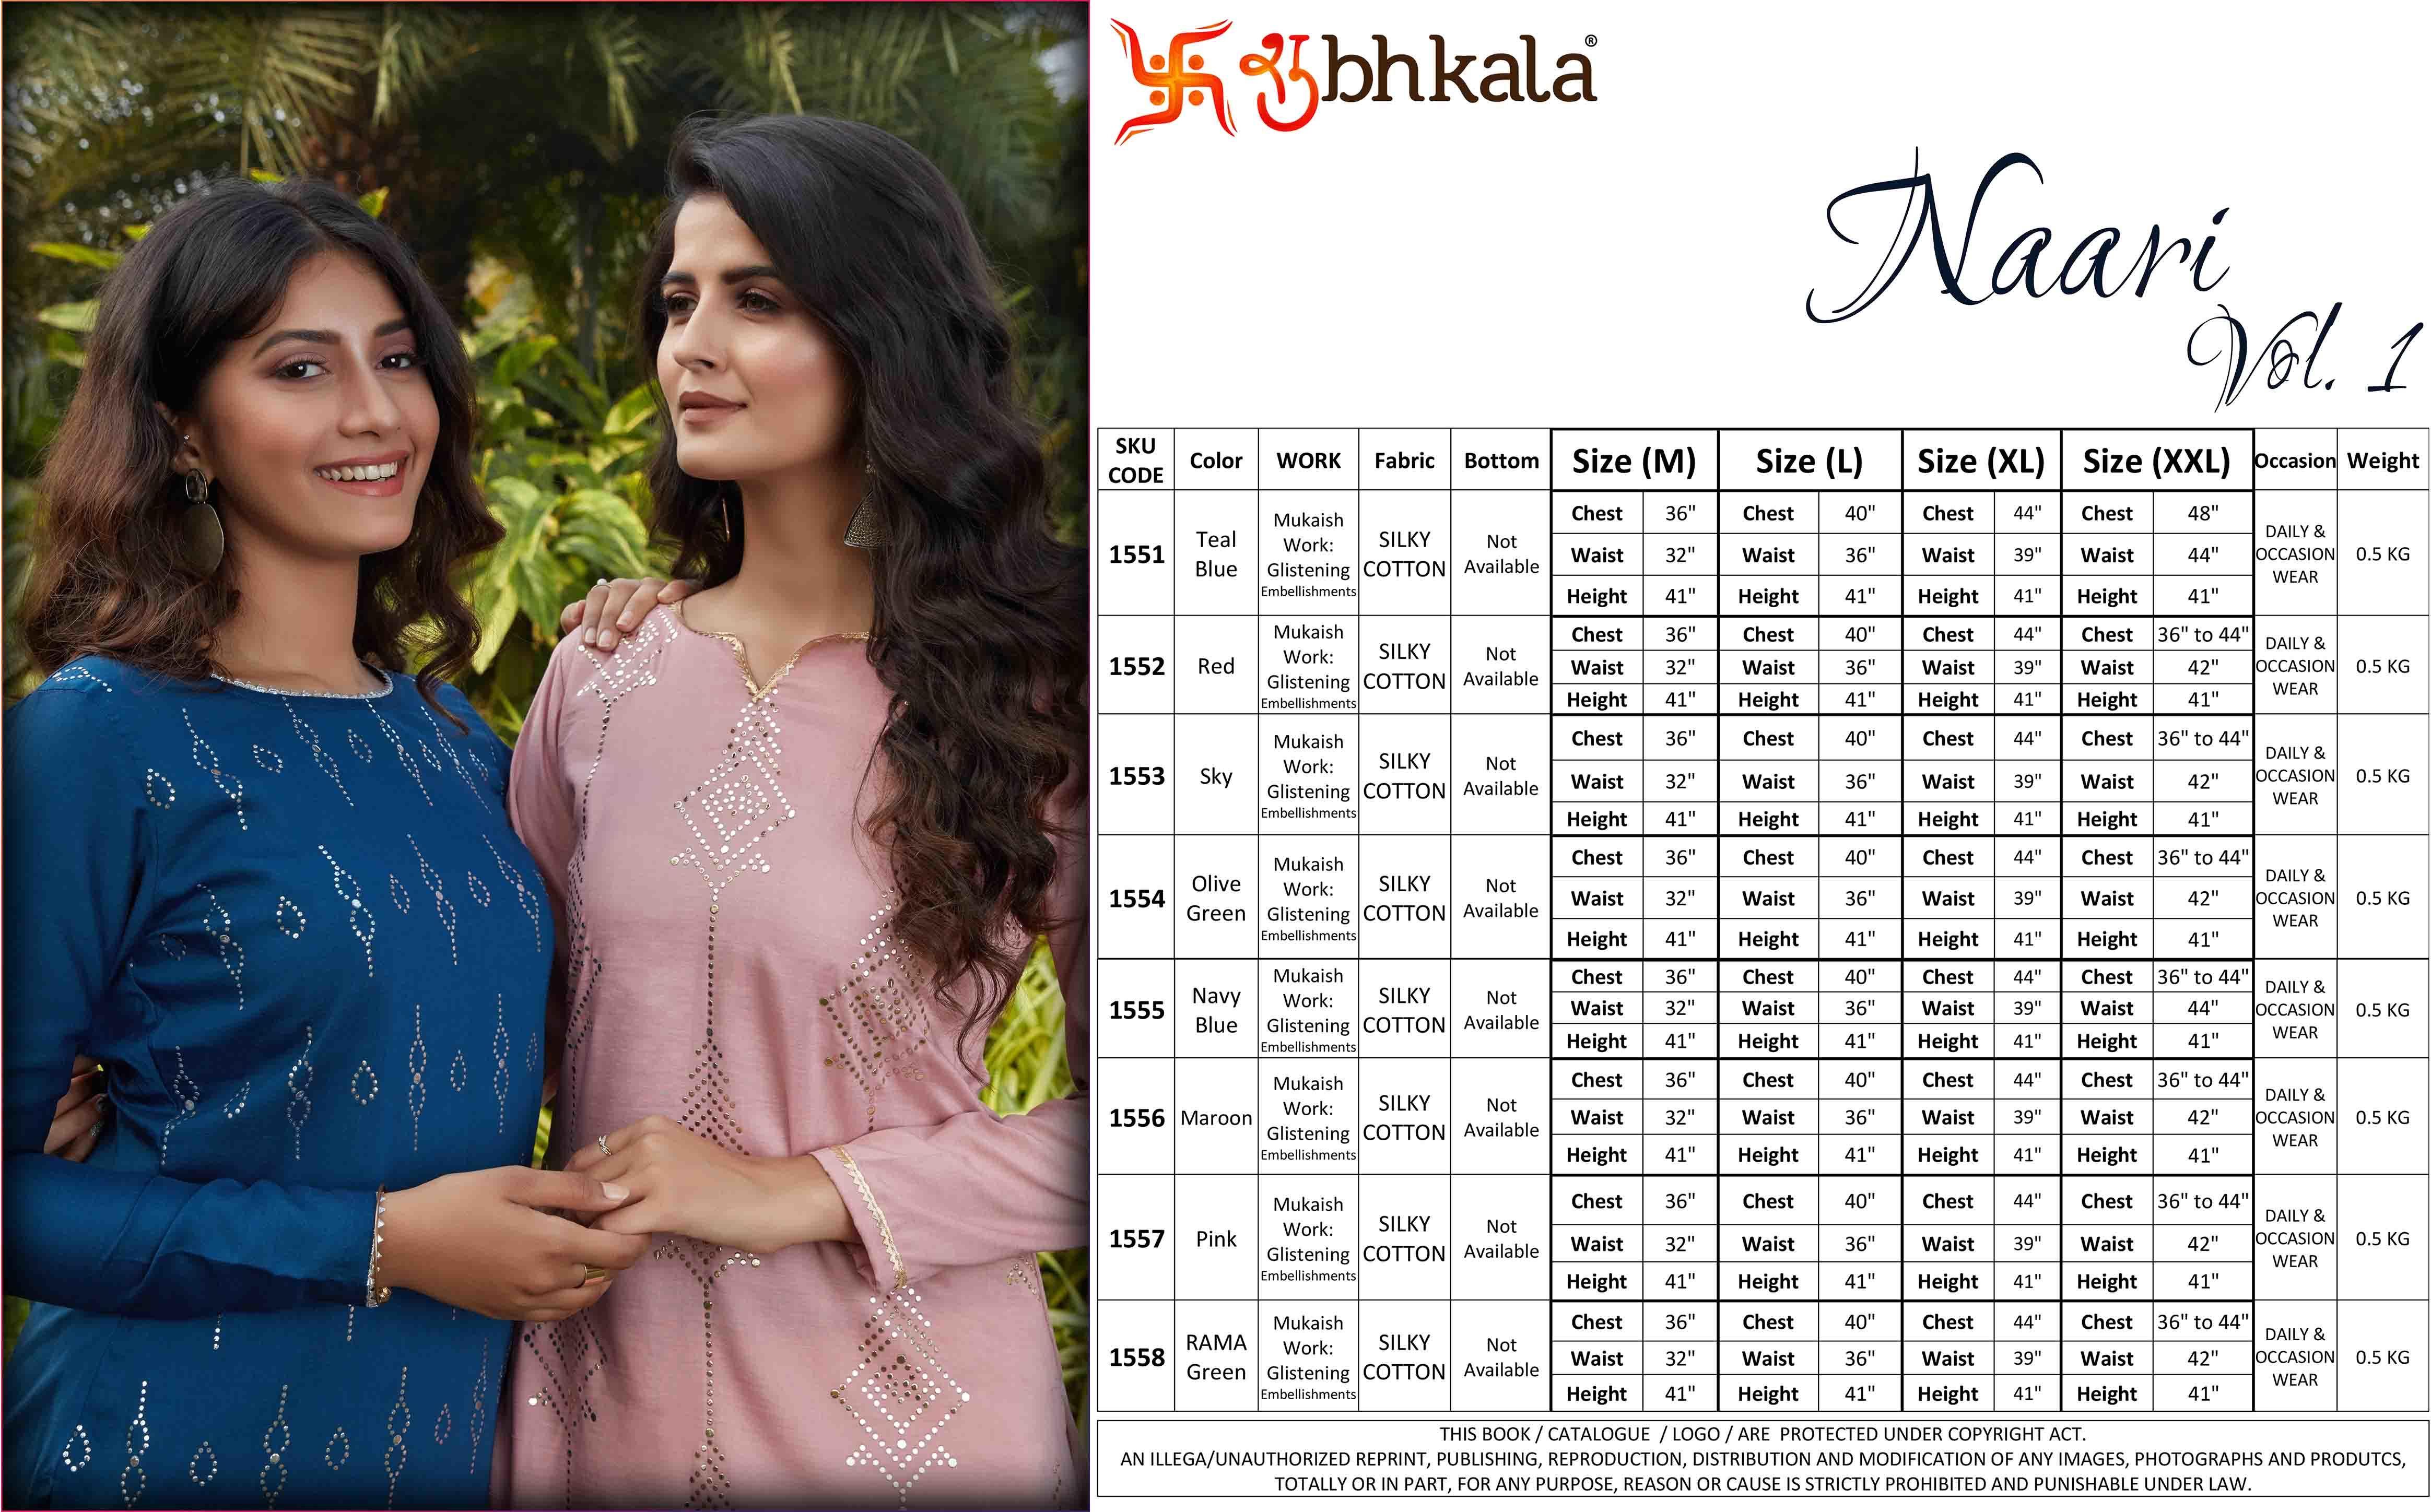 Shubhkala Naari Vol 1 Cotton Designer Kurti Catalog